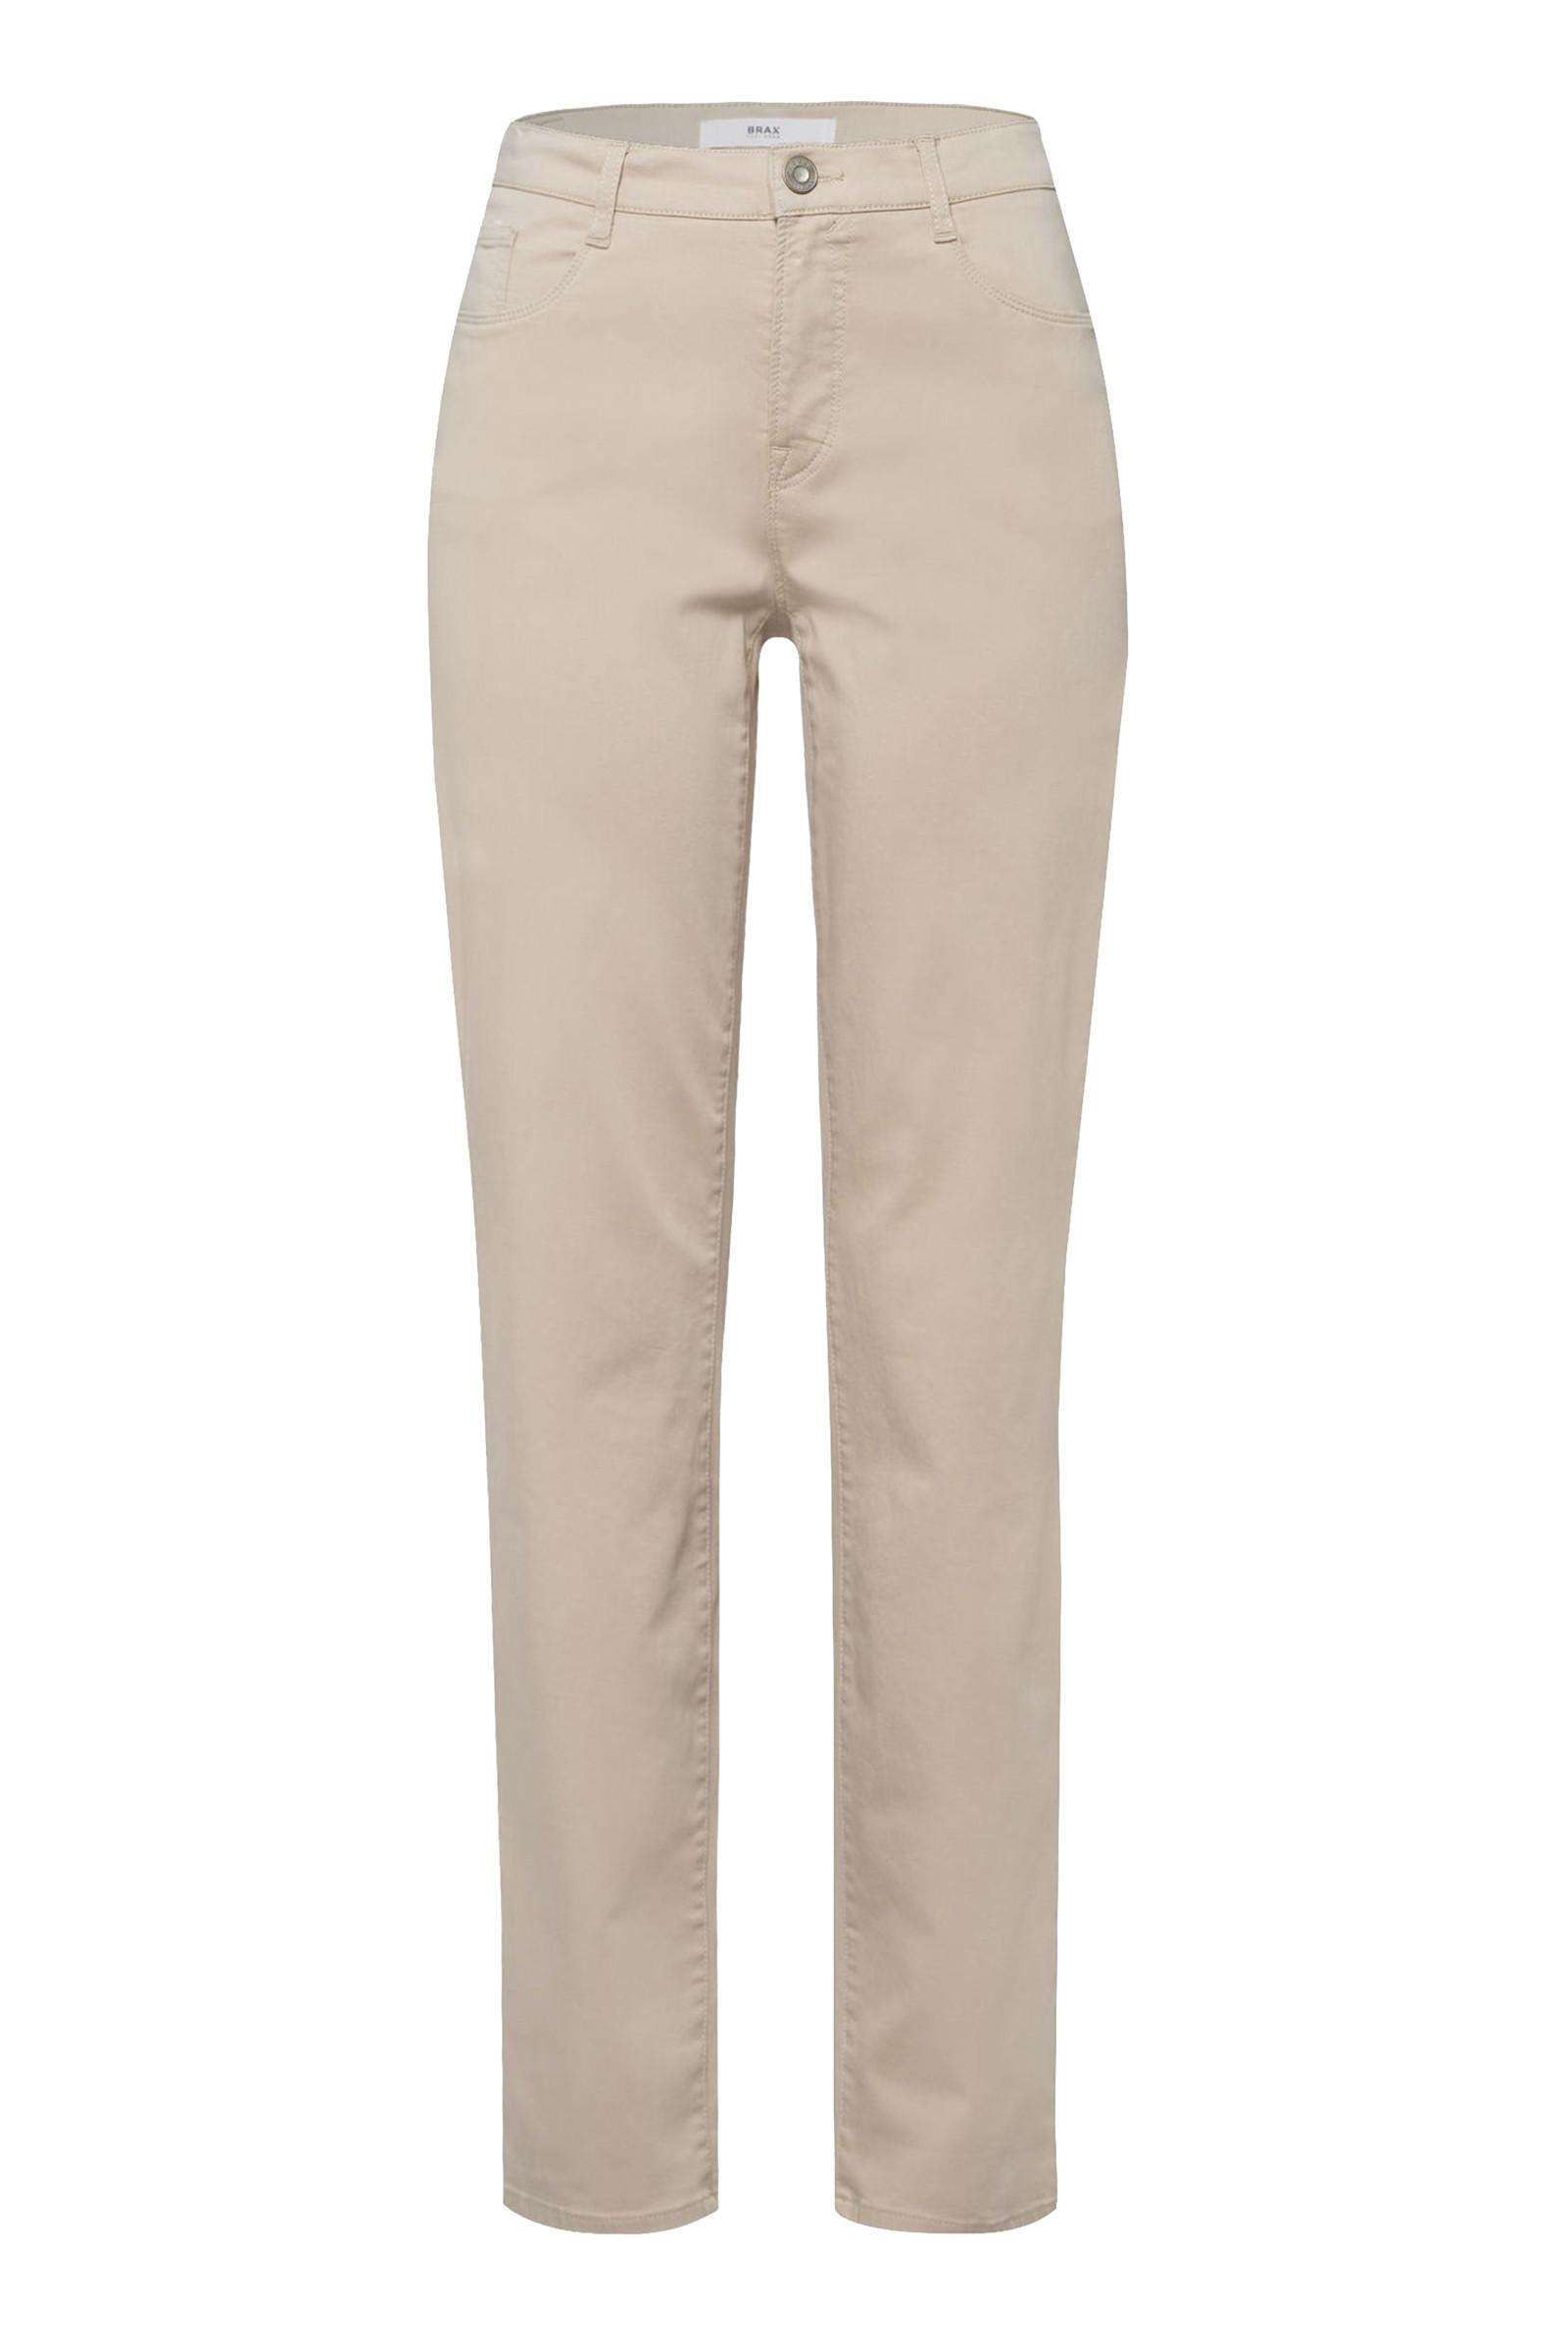 Brax tøj Shop smarte Brax bukser online hos Bustedwoman